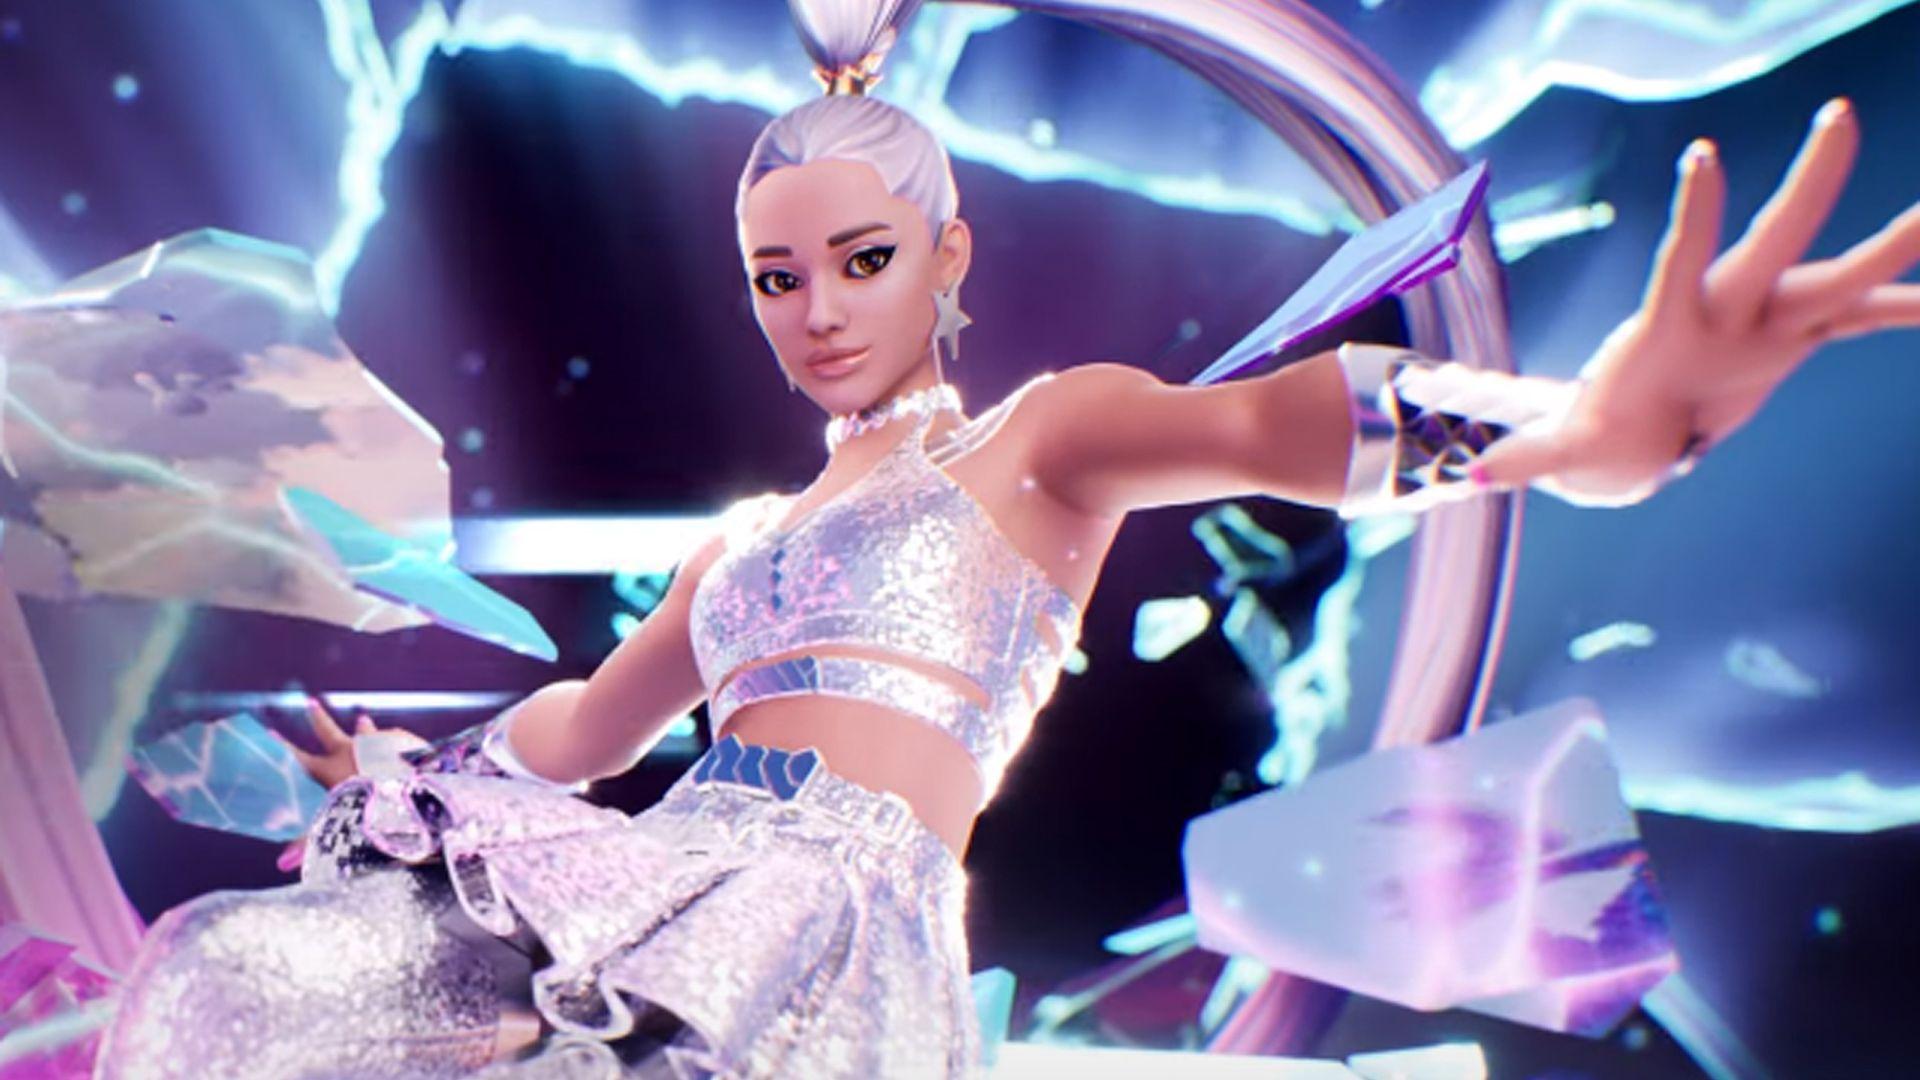 Ariana Grande Travis Scott music assaults the universes in 3D